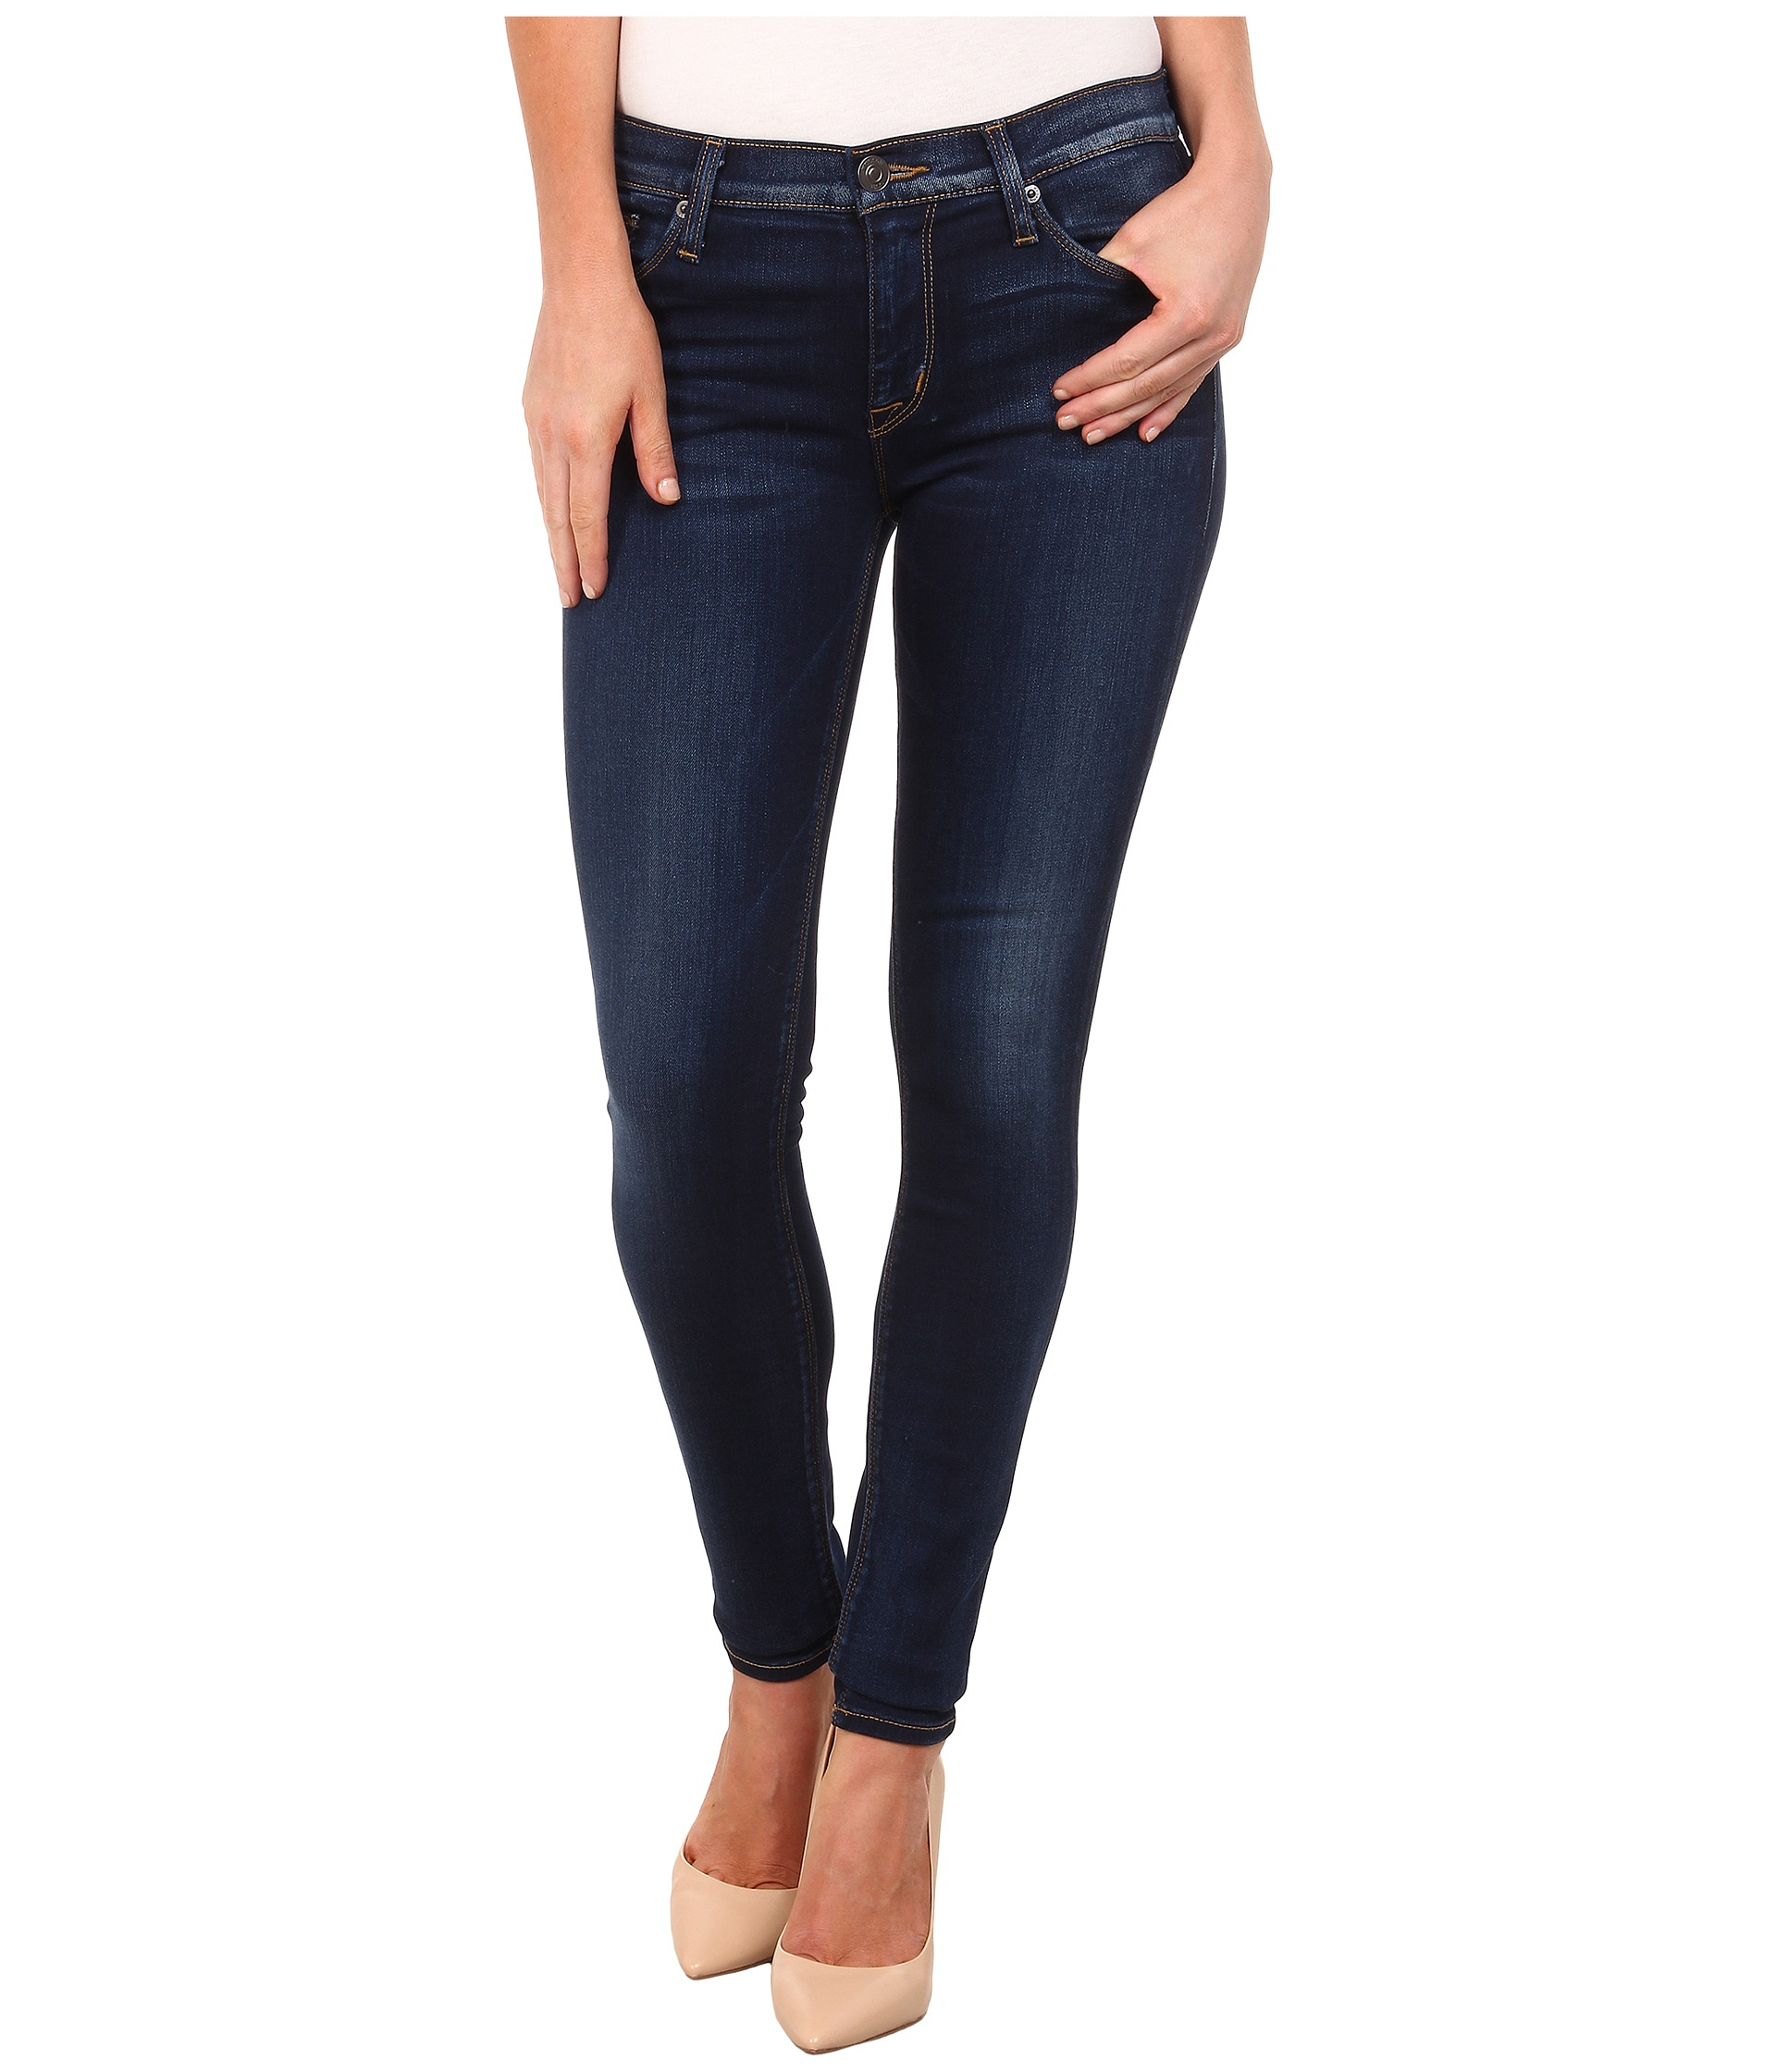 White super skinny jeans size 6 – Global fashion jeans models